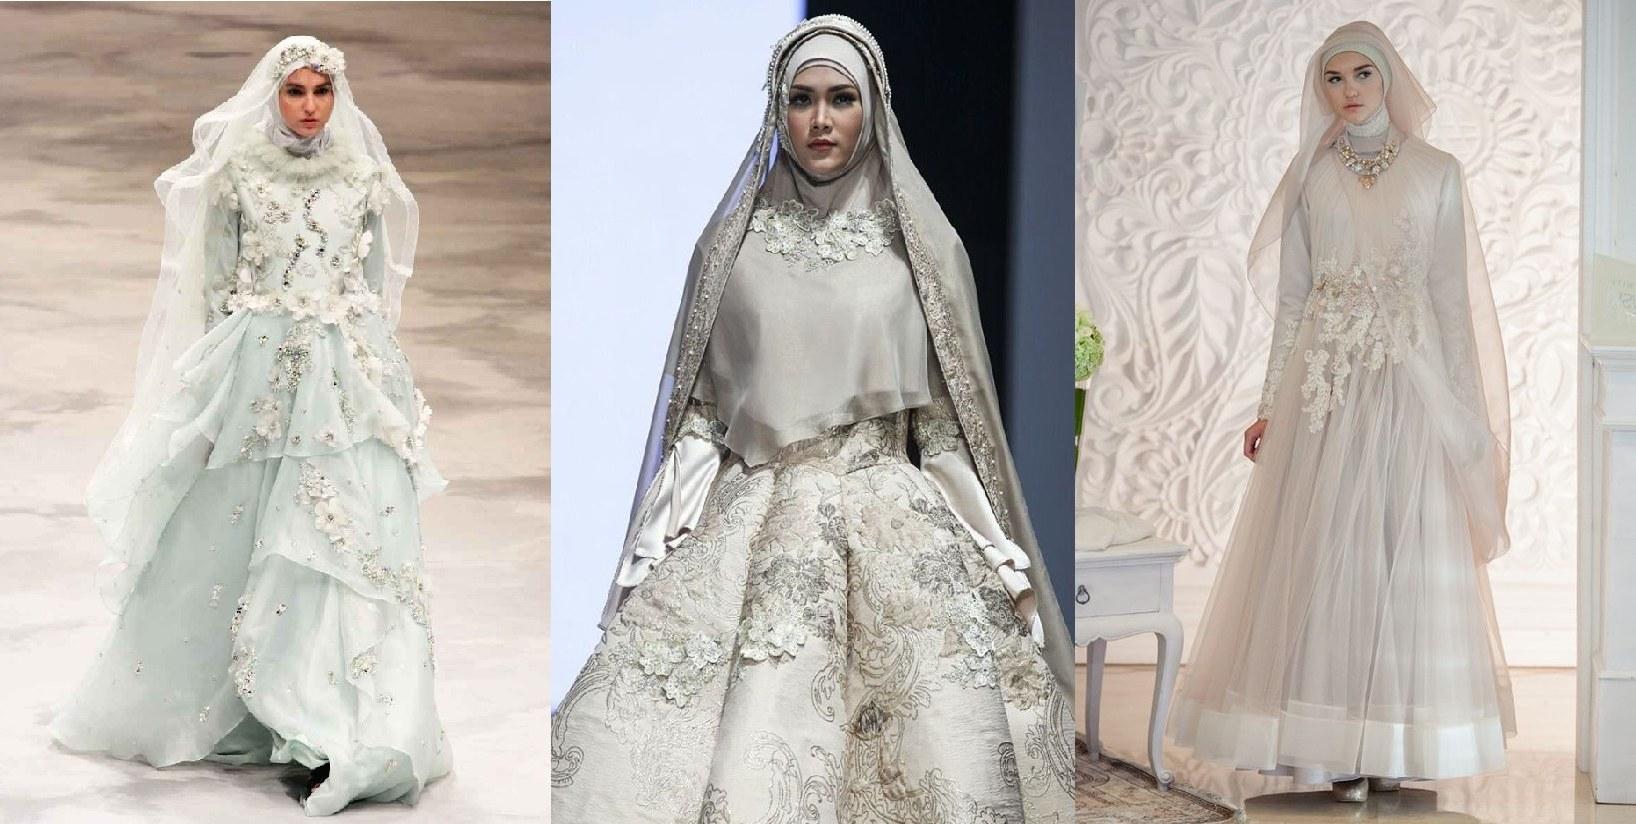 Design Baju Pengantin Muslimah Bercadar Rldj Inspirasi Gaun Pengantin Untuk Muslimah Bercadar Prelo